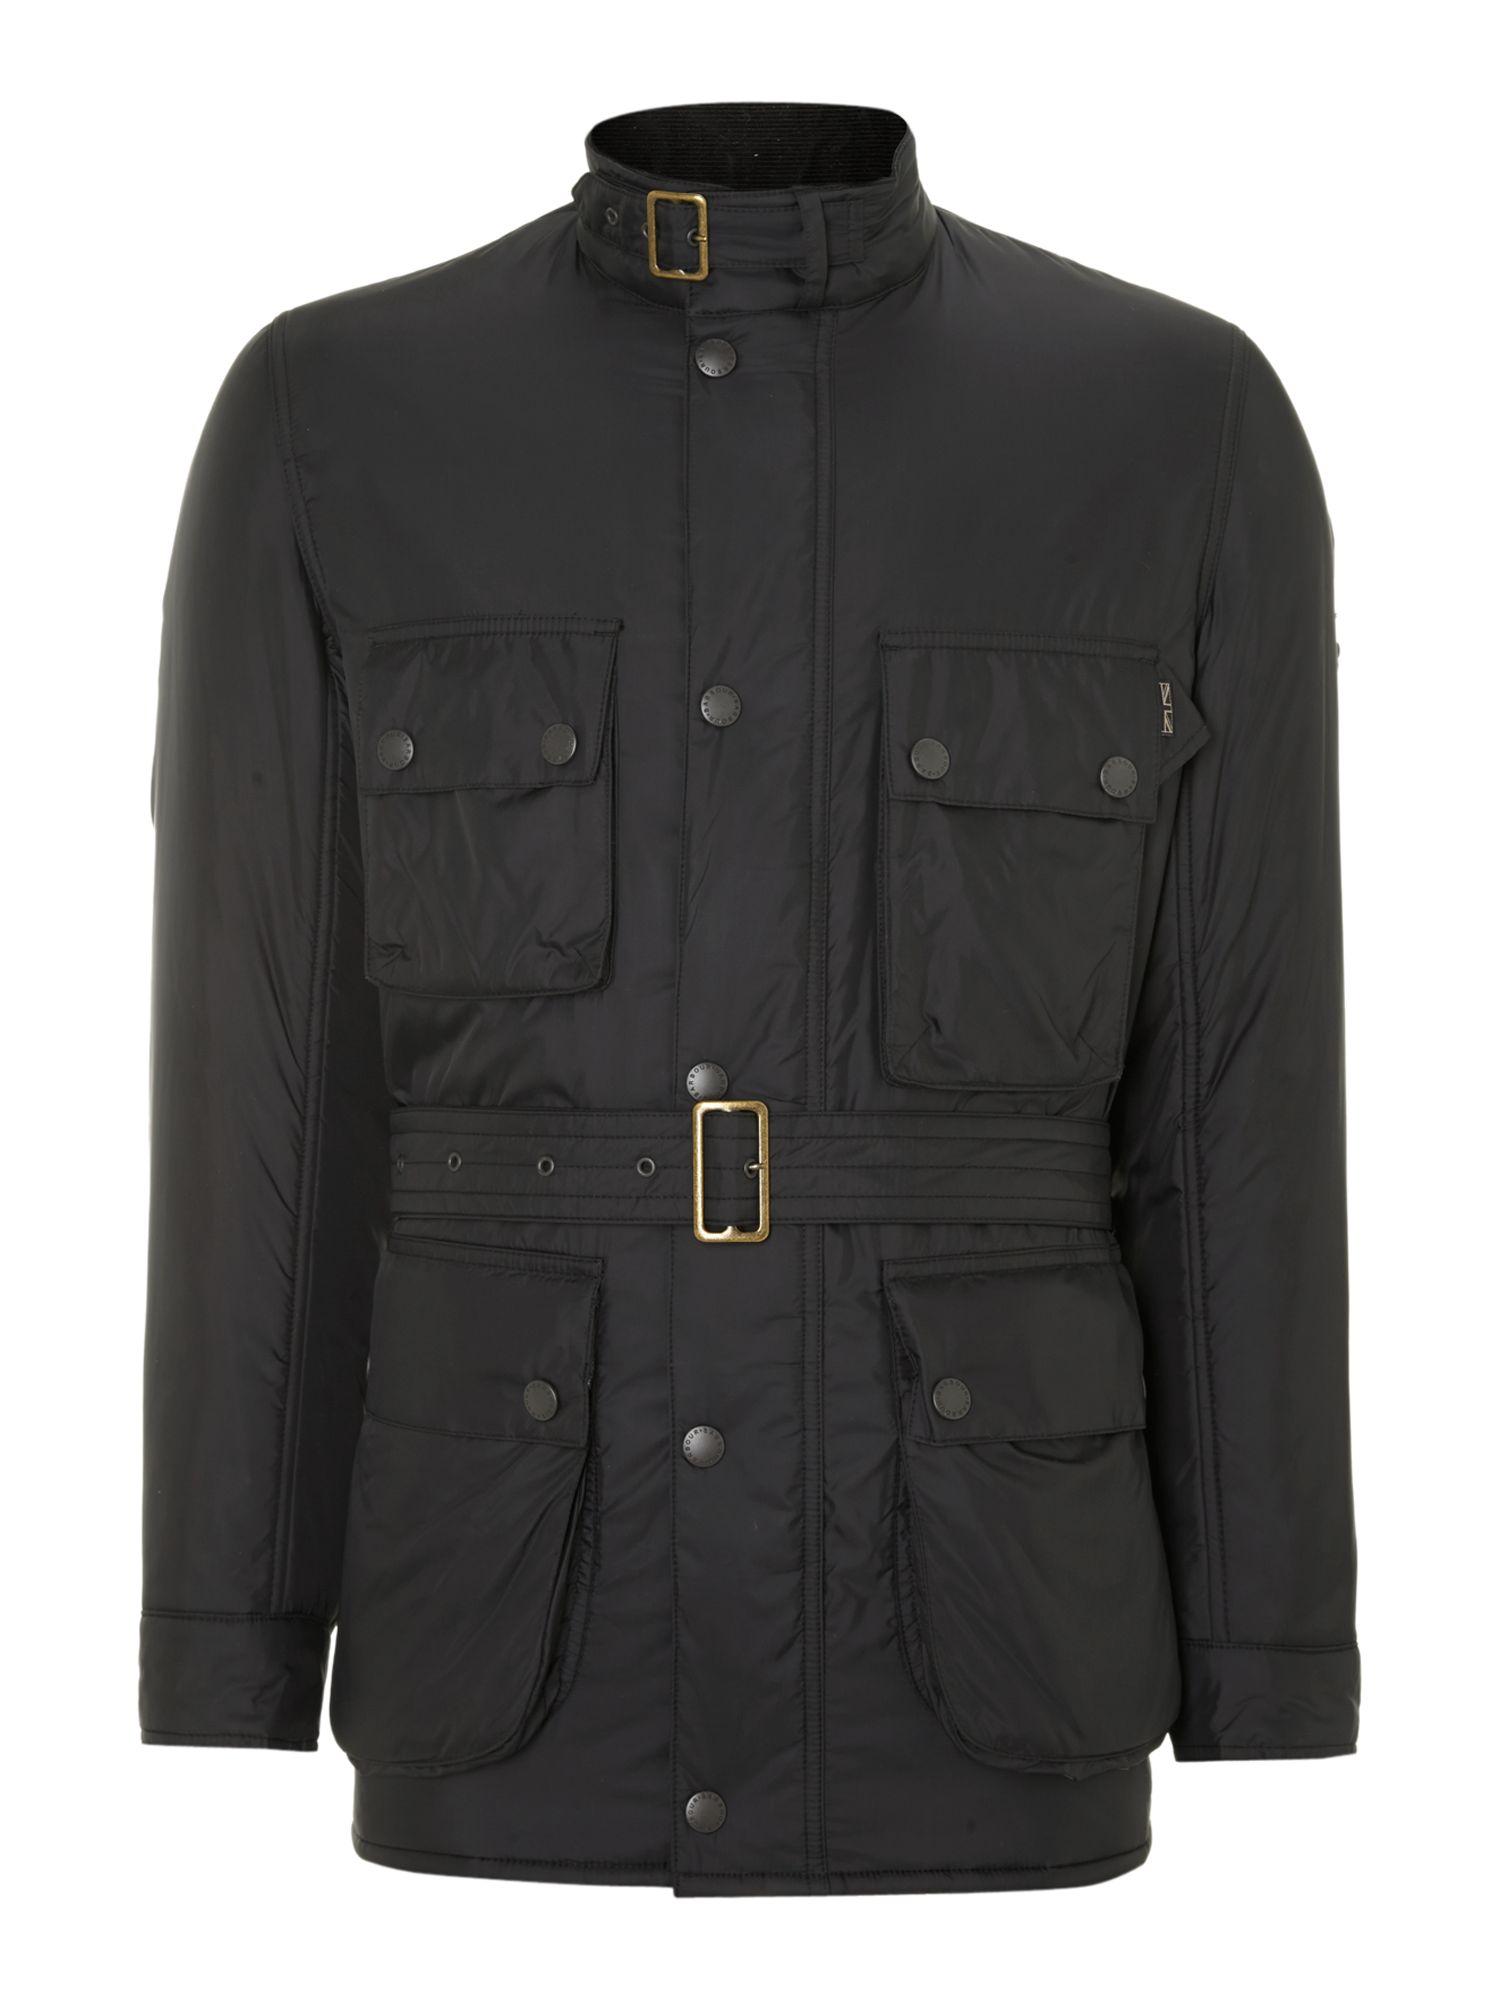 Barbour Padded International Jacket In Black For Men Lyst